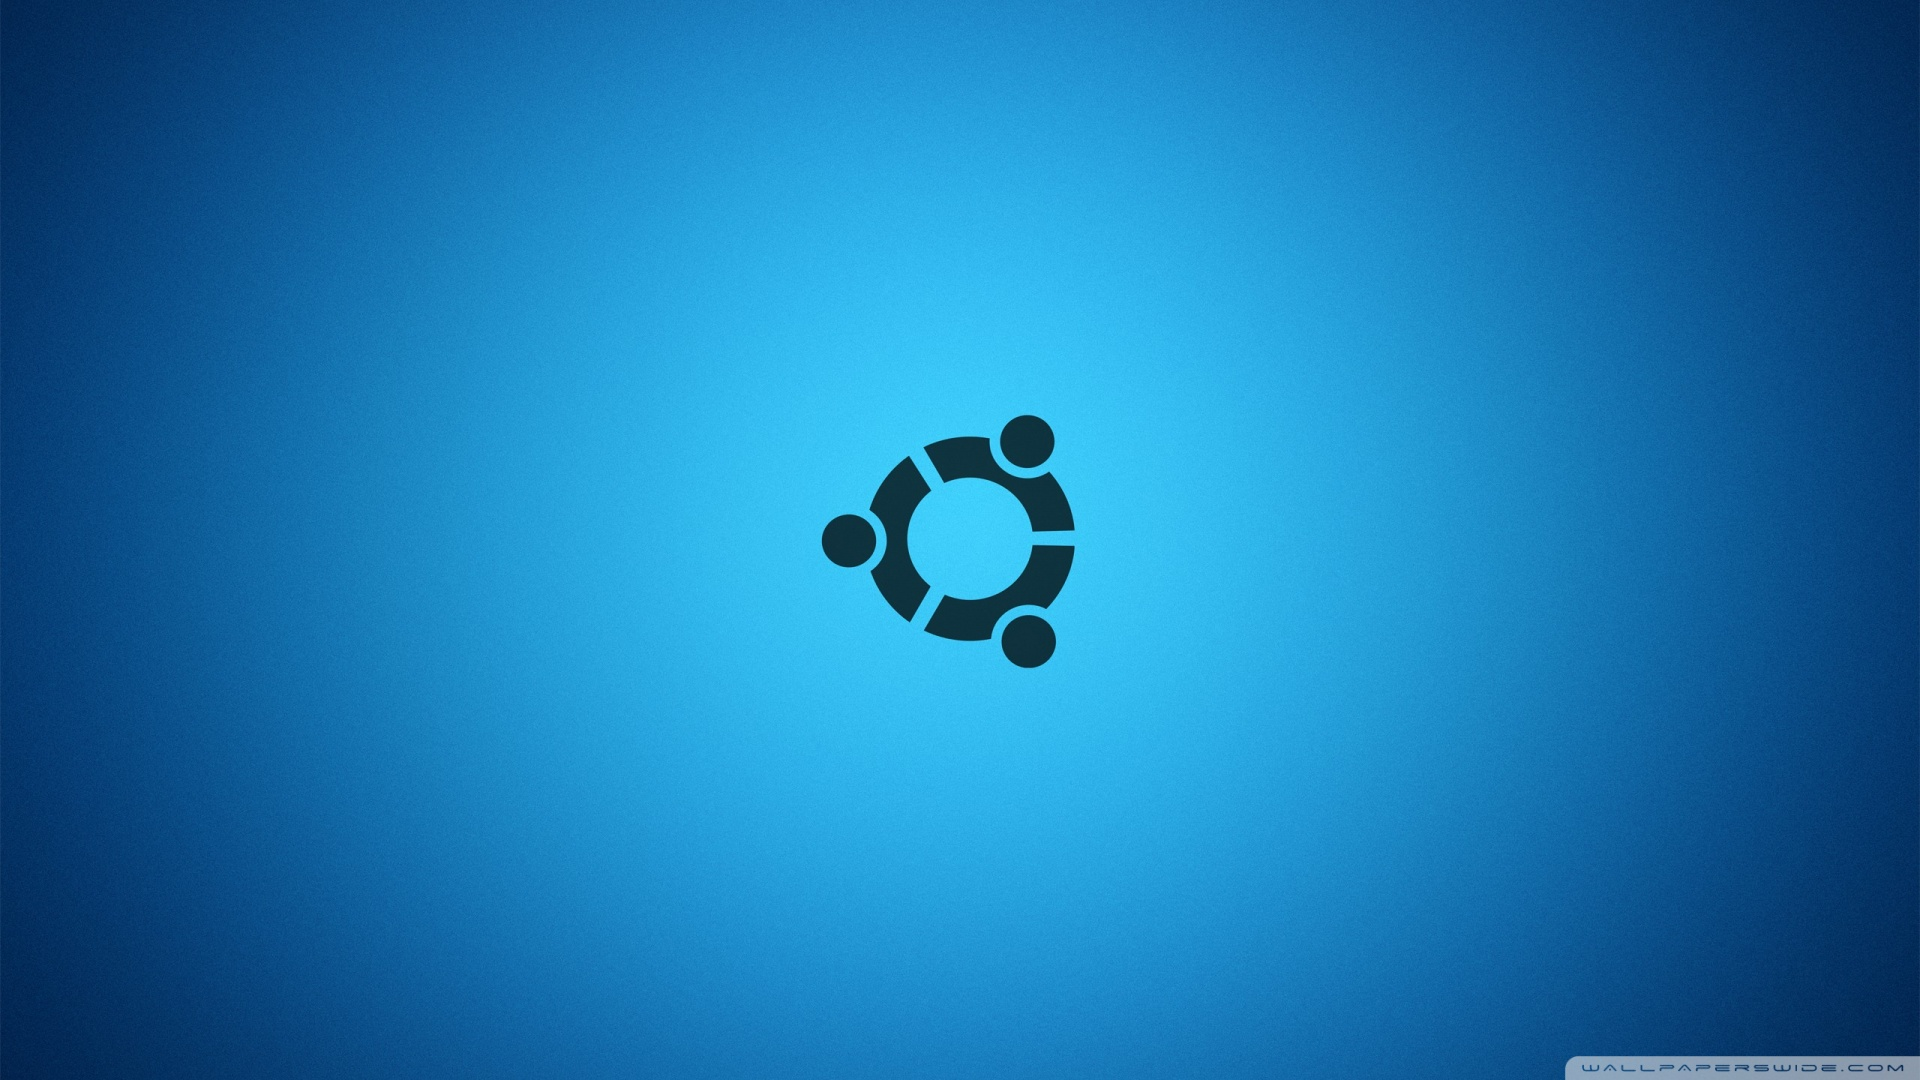 wallpopercomimages00440212ubuntu desktop blue 00440212jpg 1920x1080